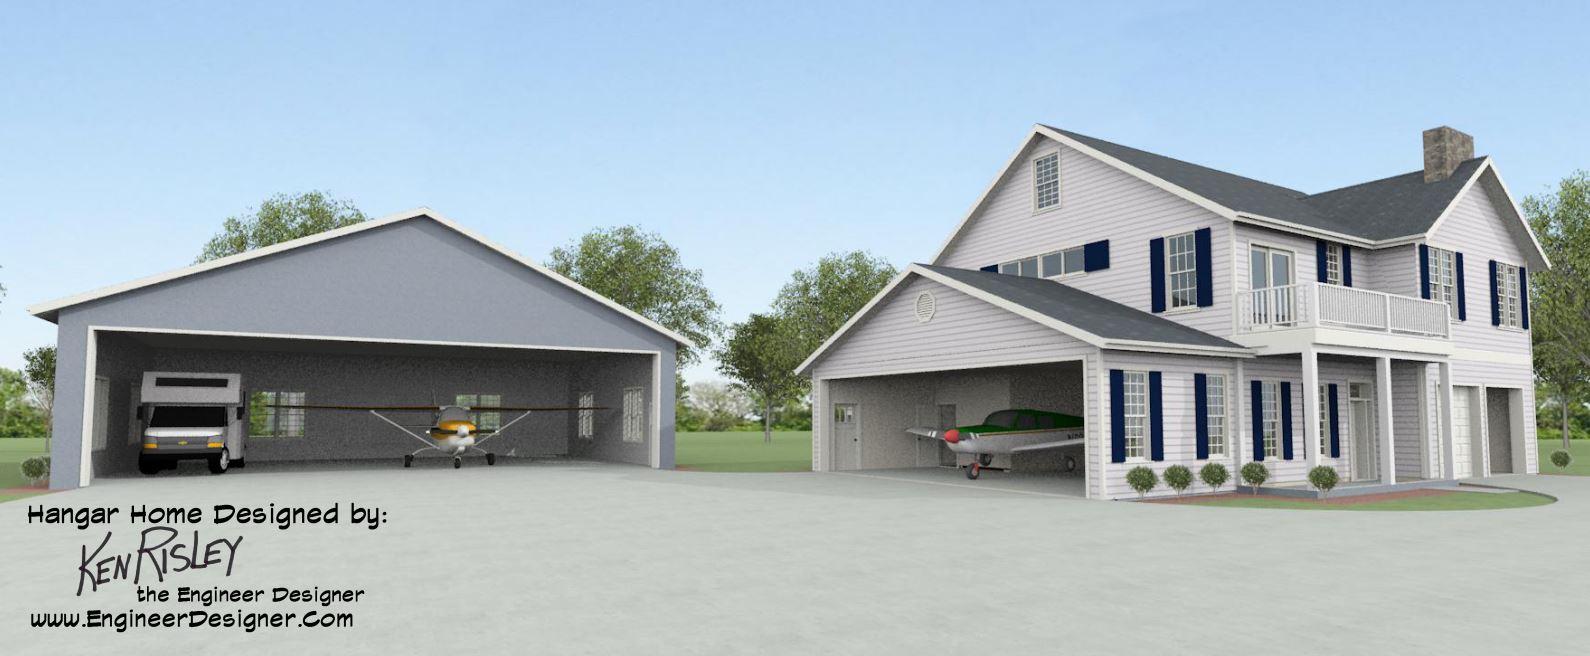 When Considering A Hangar Home Design